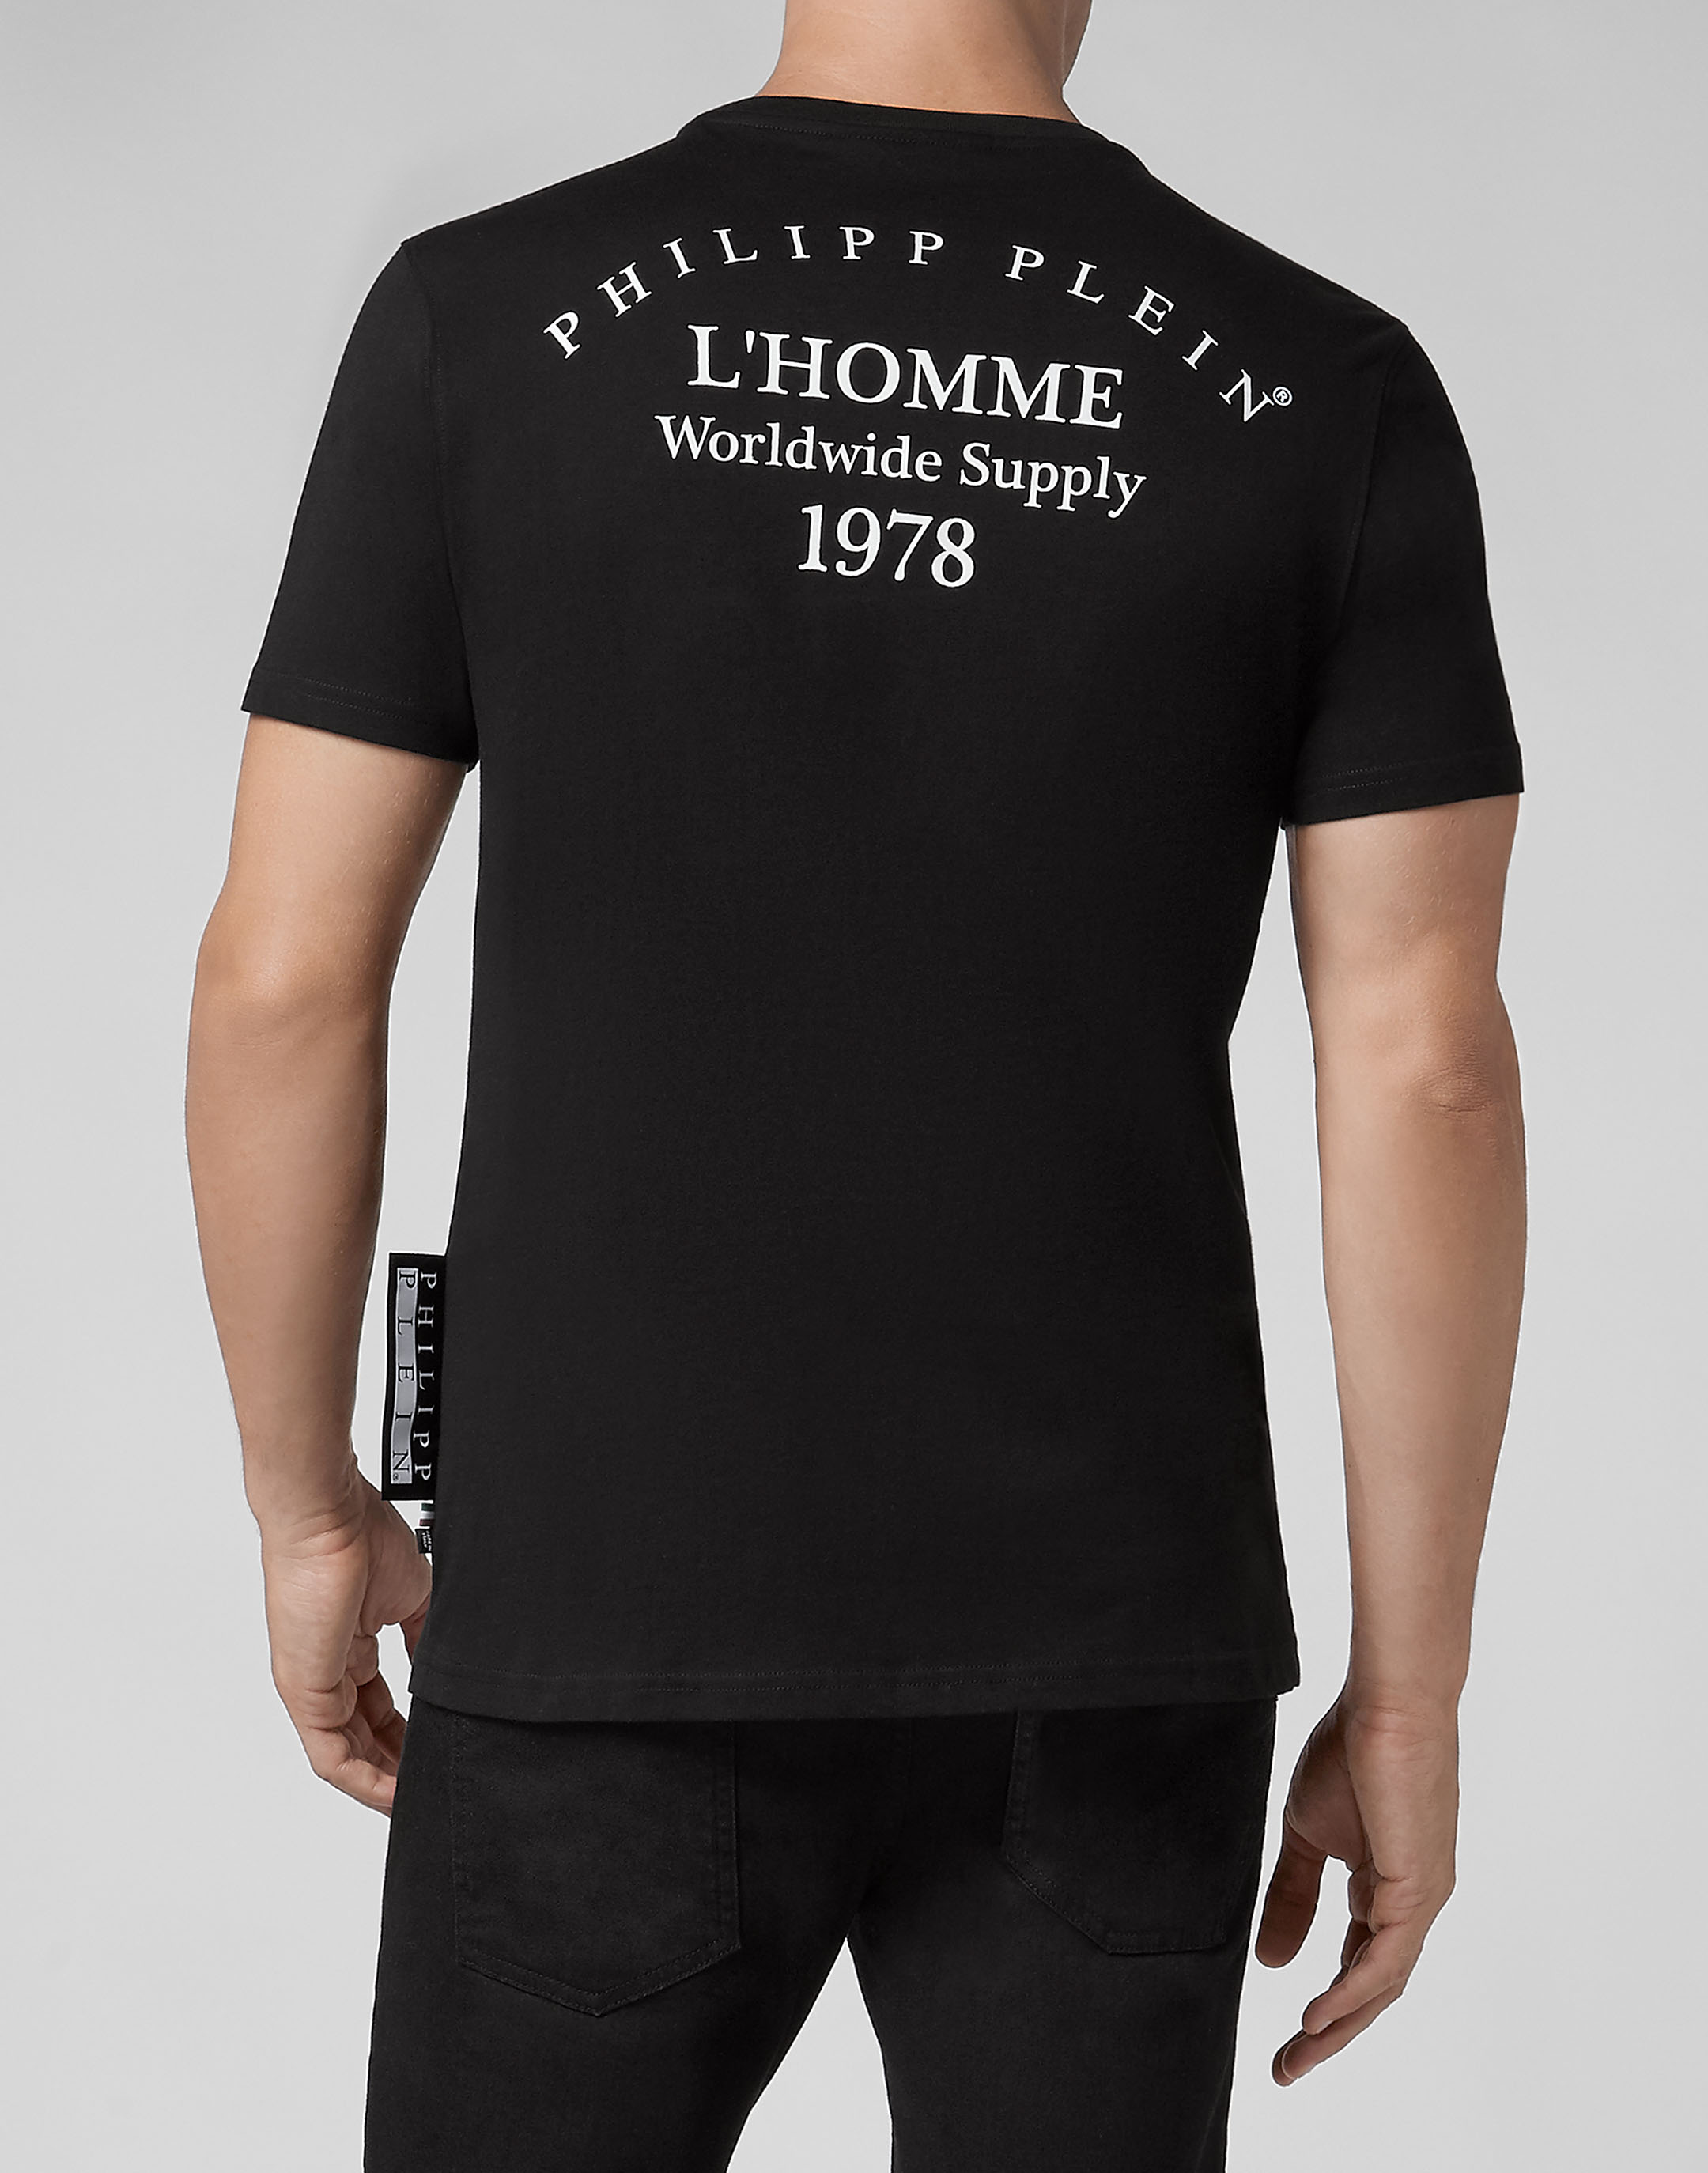 T-shirt Platinum Cut Round Neck Philipp Plein TM   Philipp Plein 187e6fbeb0f